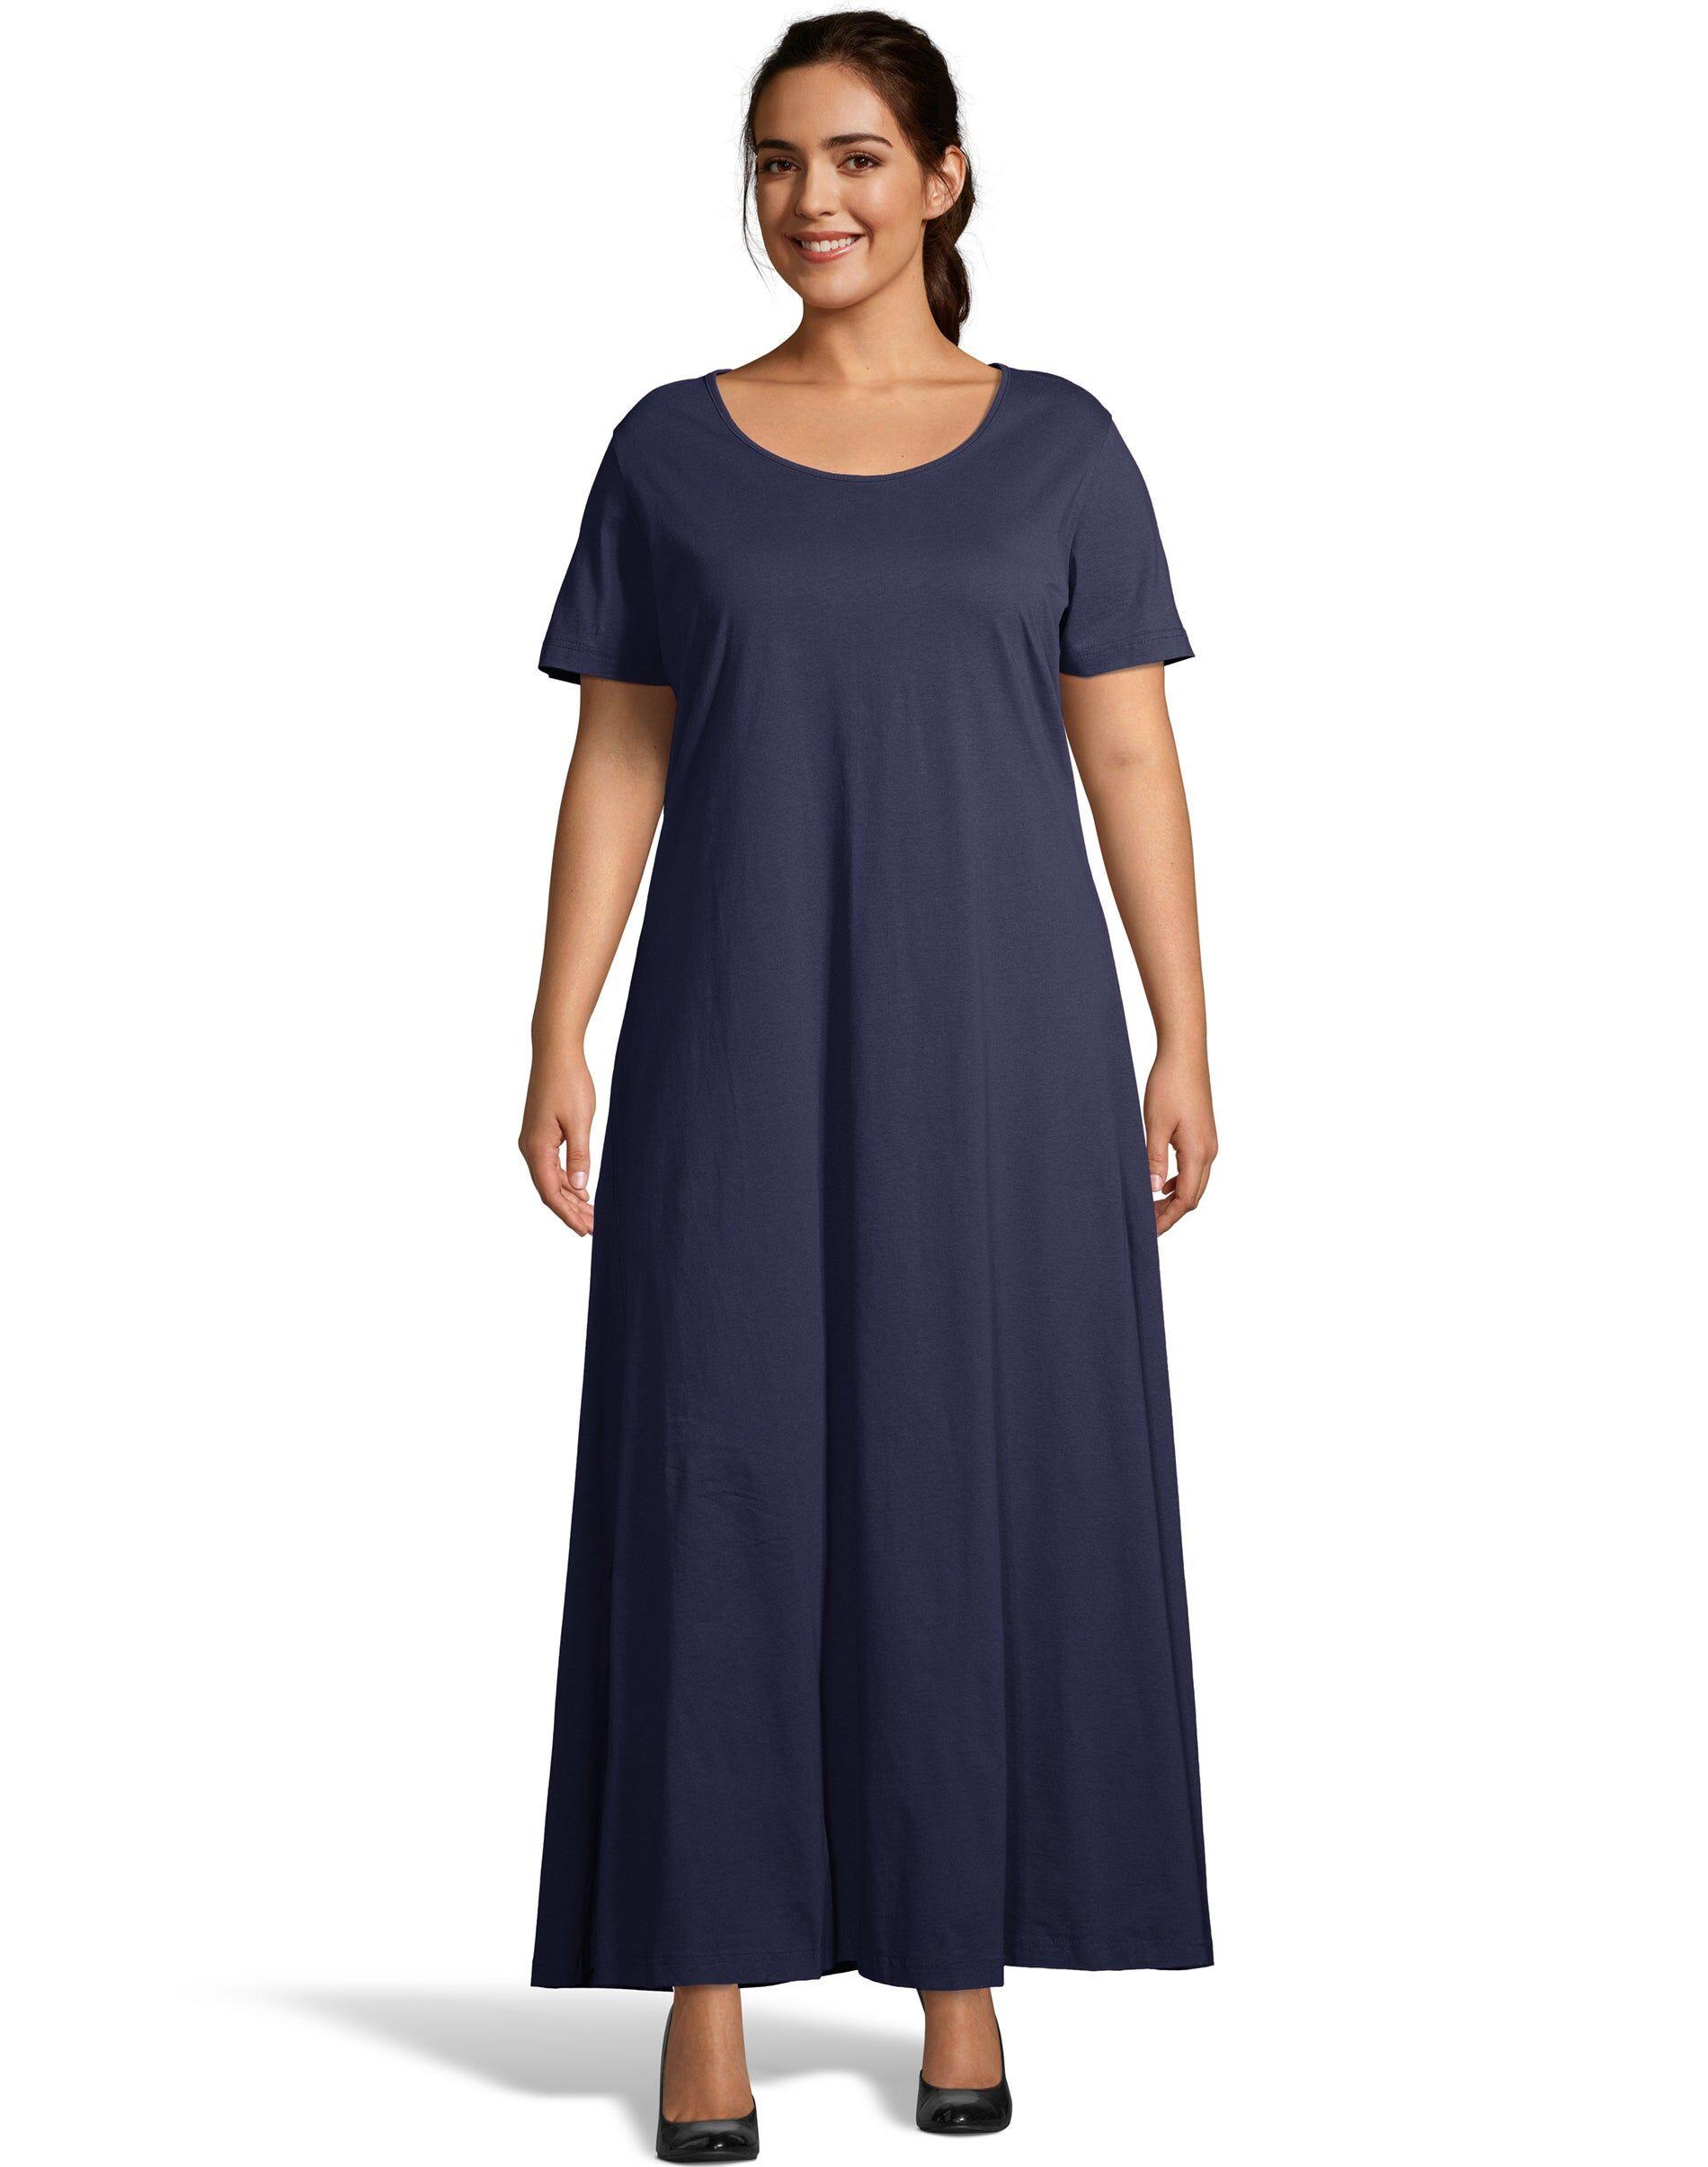 Just My Size Jersey Matchables Maxi Dress Navy 2X Women's